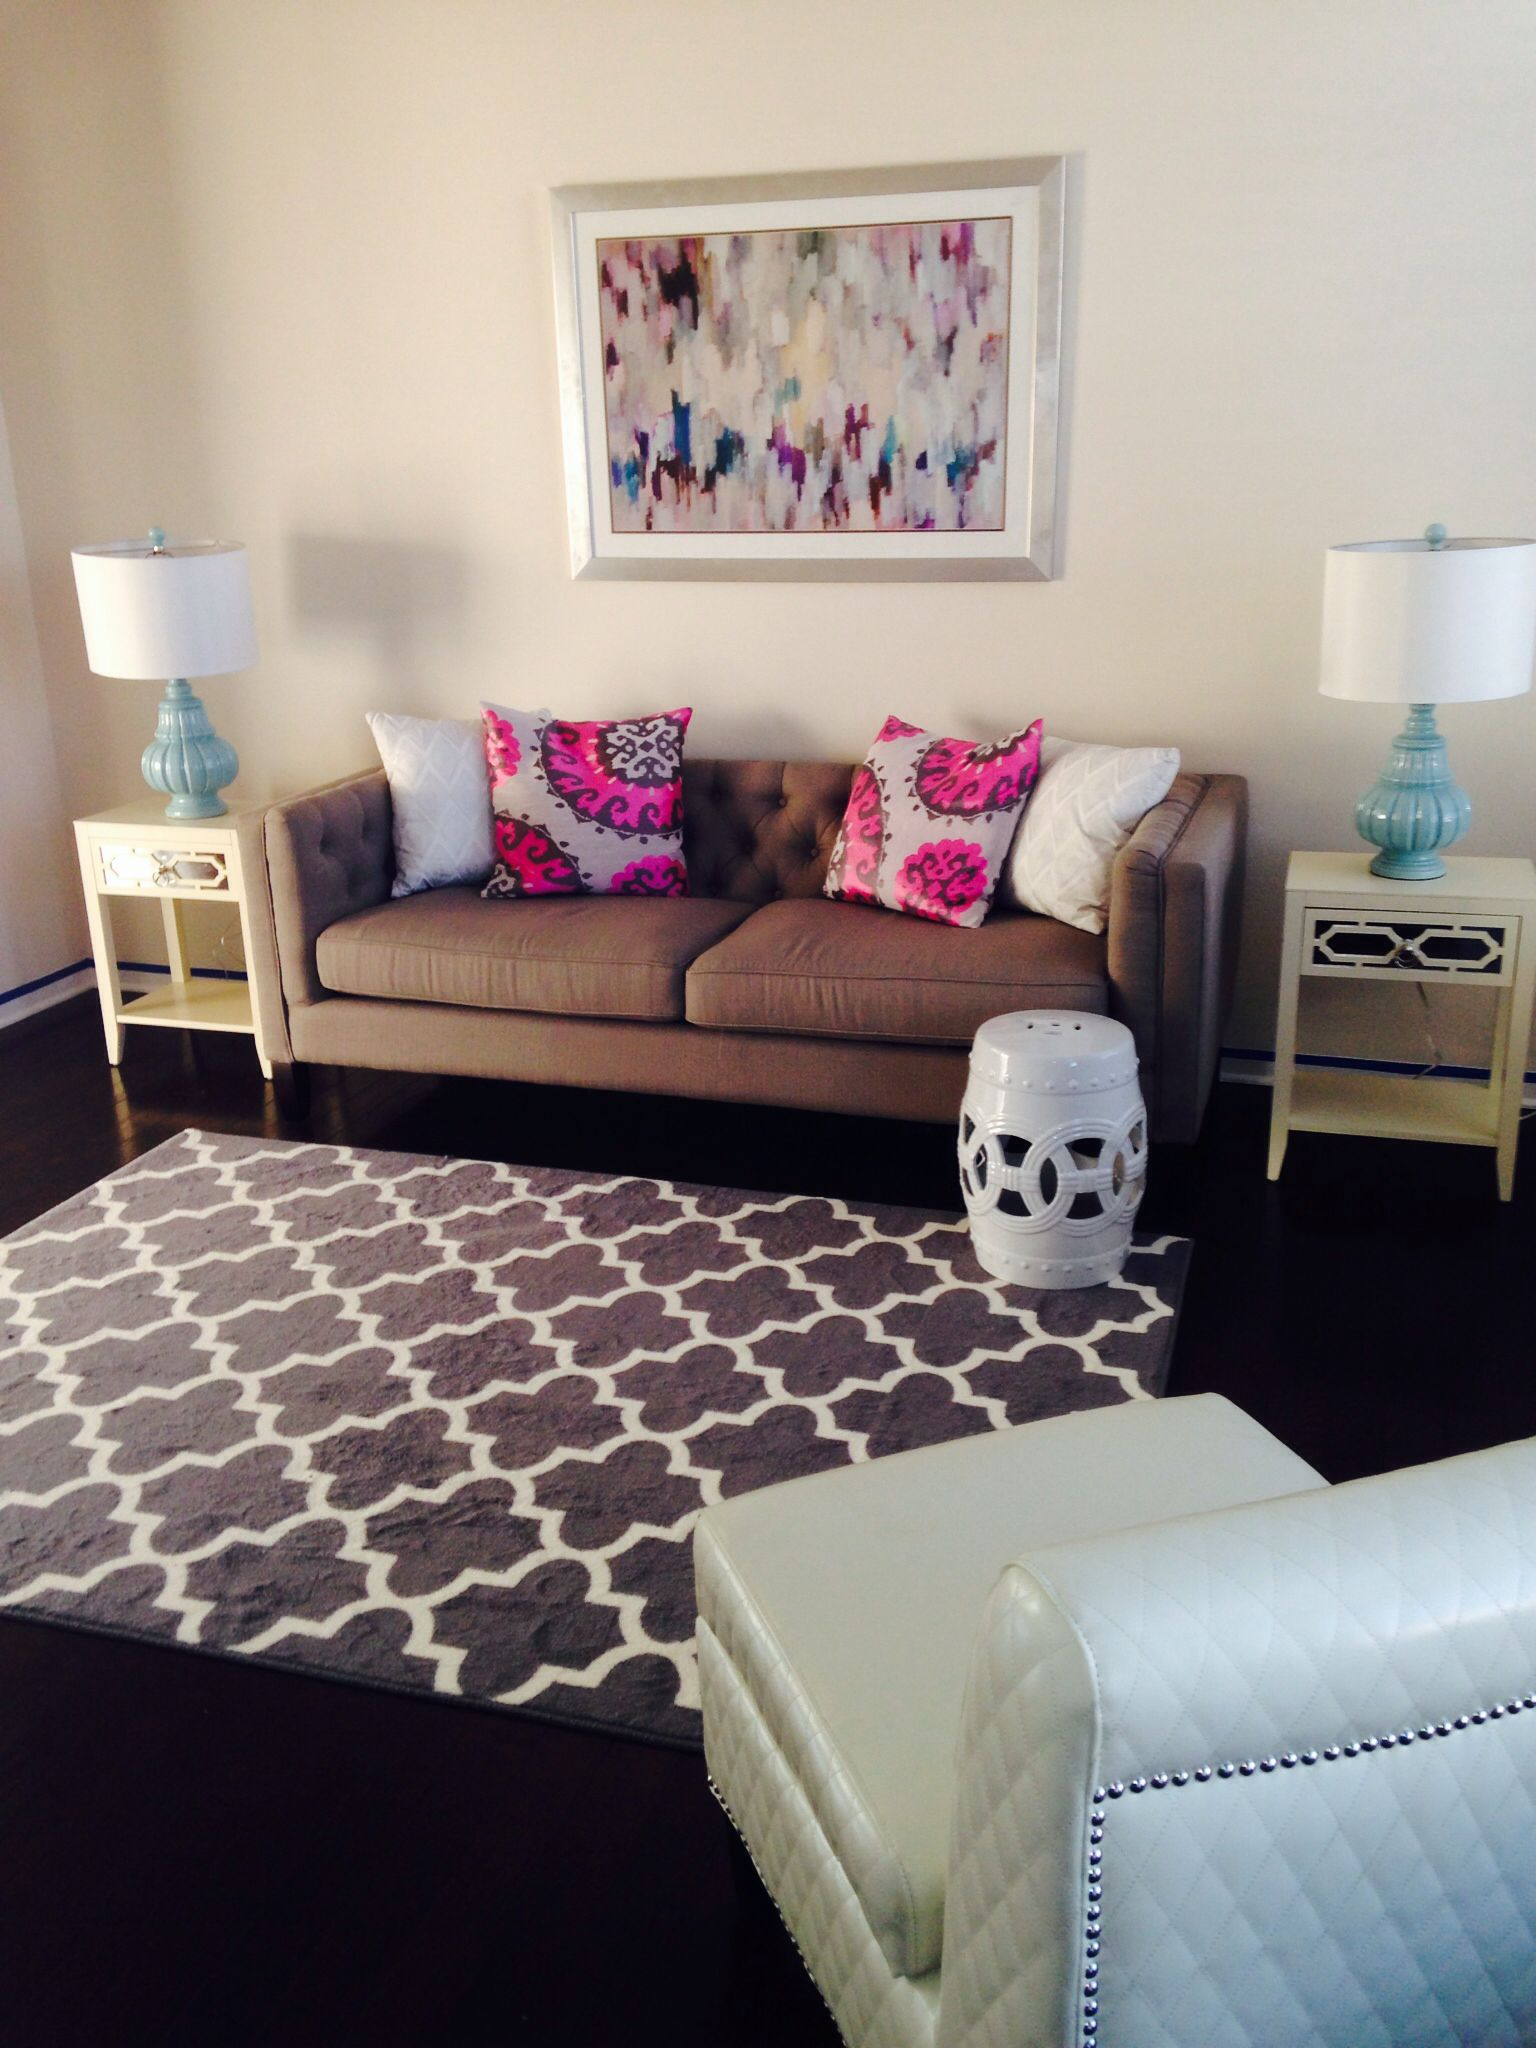 astonishing cute living room idea   Small living room   Future Home ideas and decore   Pinterest